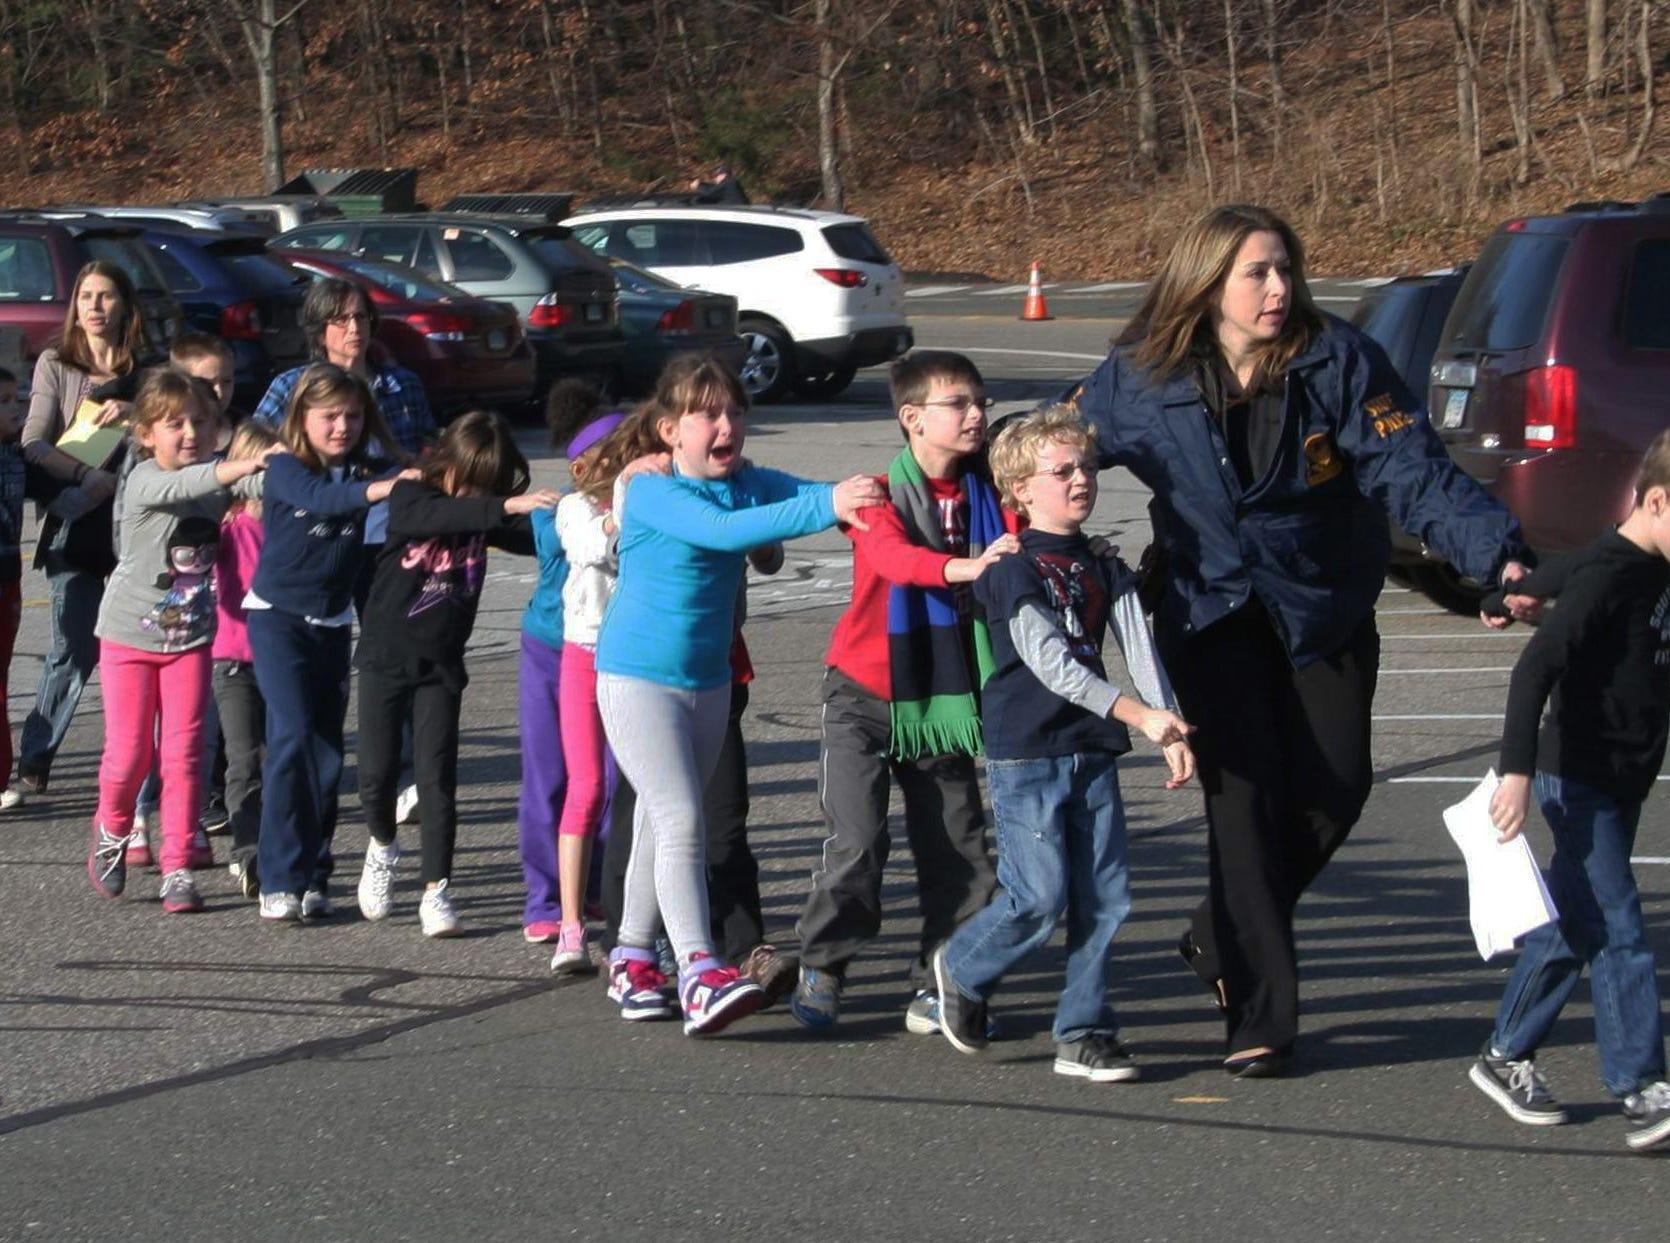 Sandy Hook Elementary School   Newtown, Connecticut   Dec. 14, 2012   28 dead   2 wounded